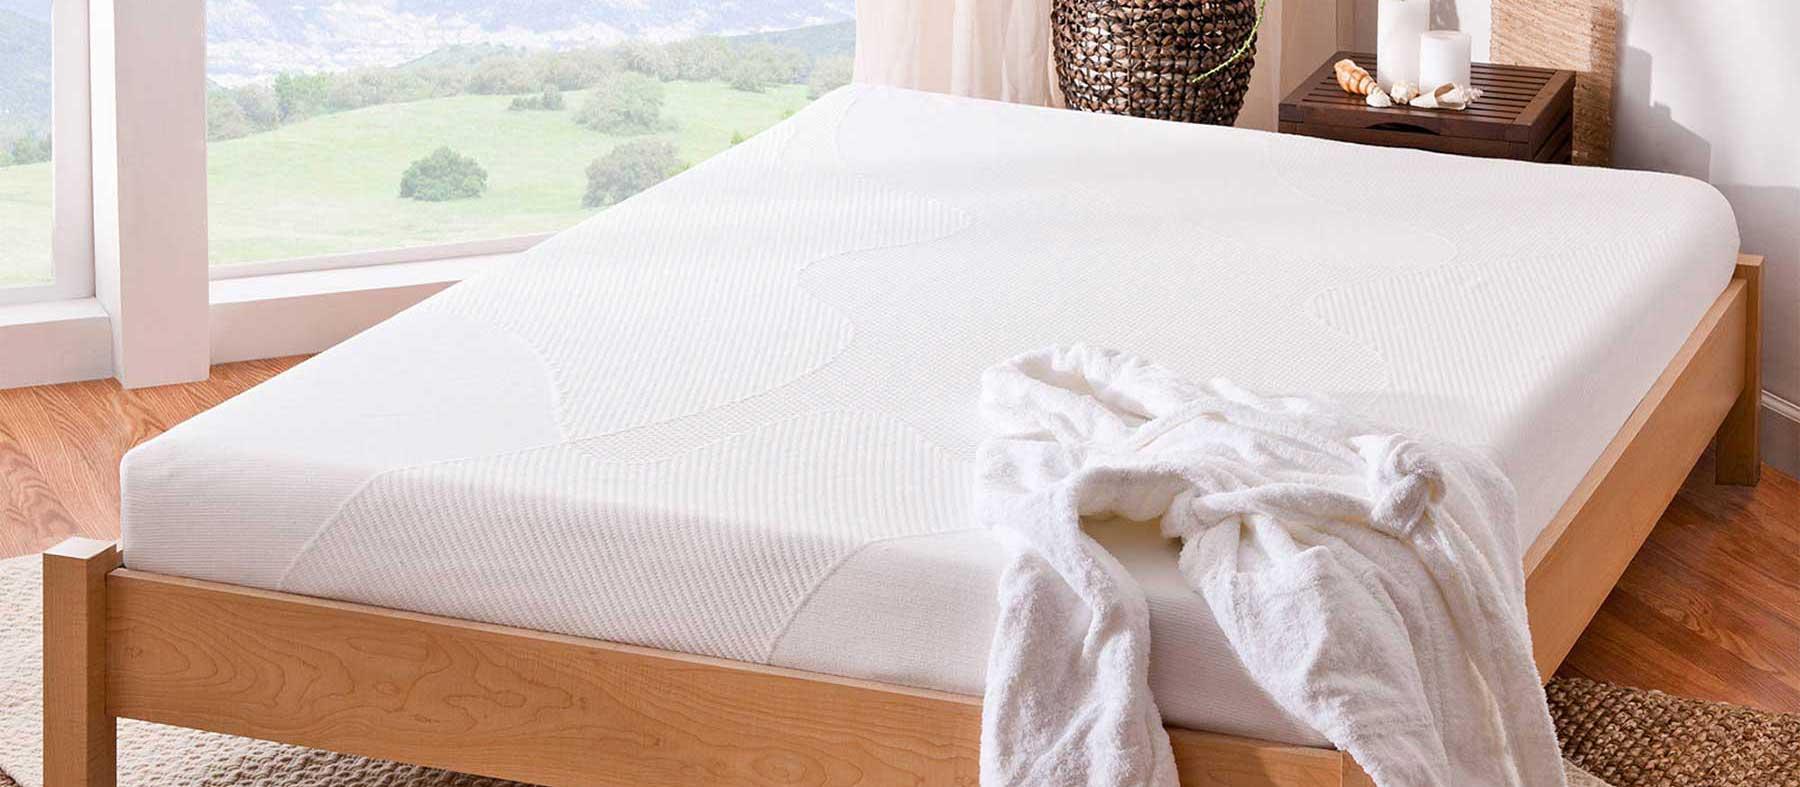 Kvalitetan dušek garantuje dobar odmor.